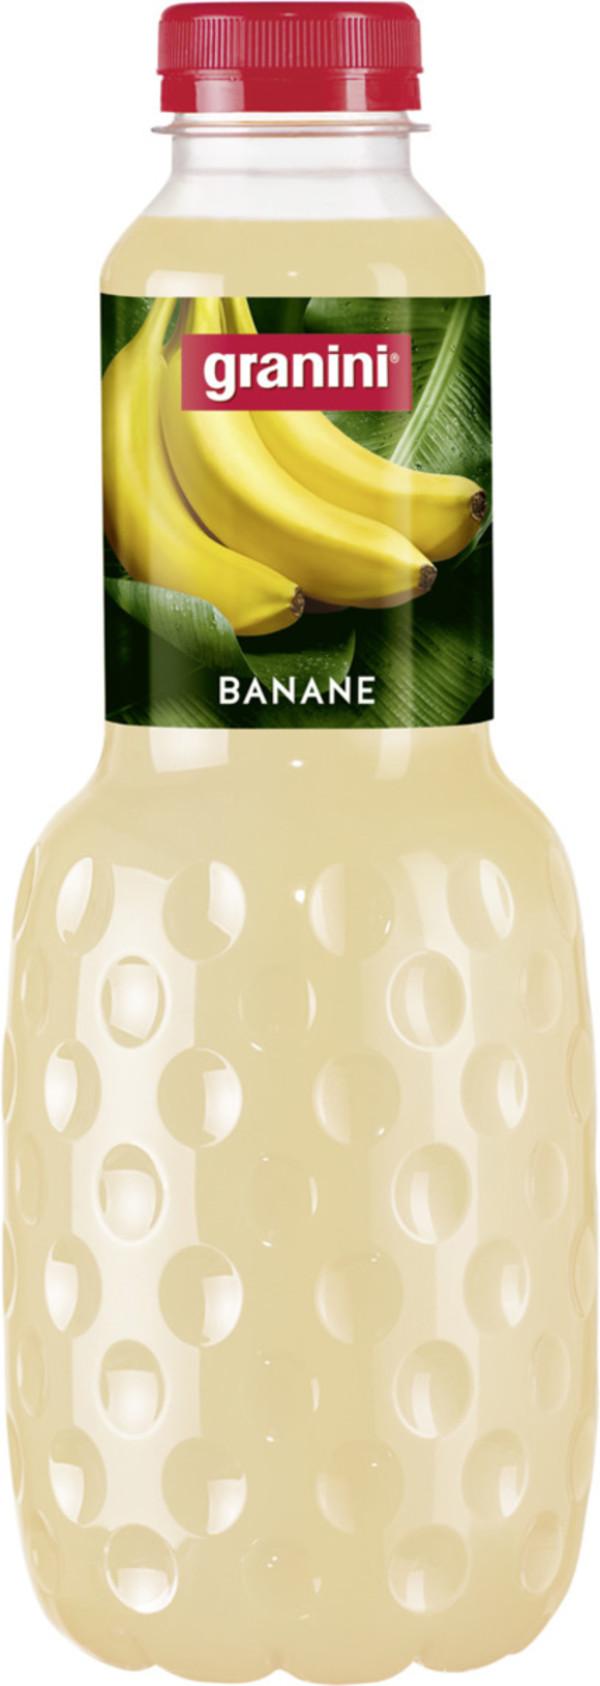 Granini Banane Nektar 1 ltr PET